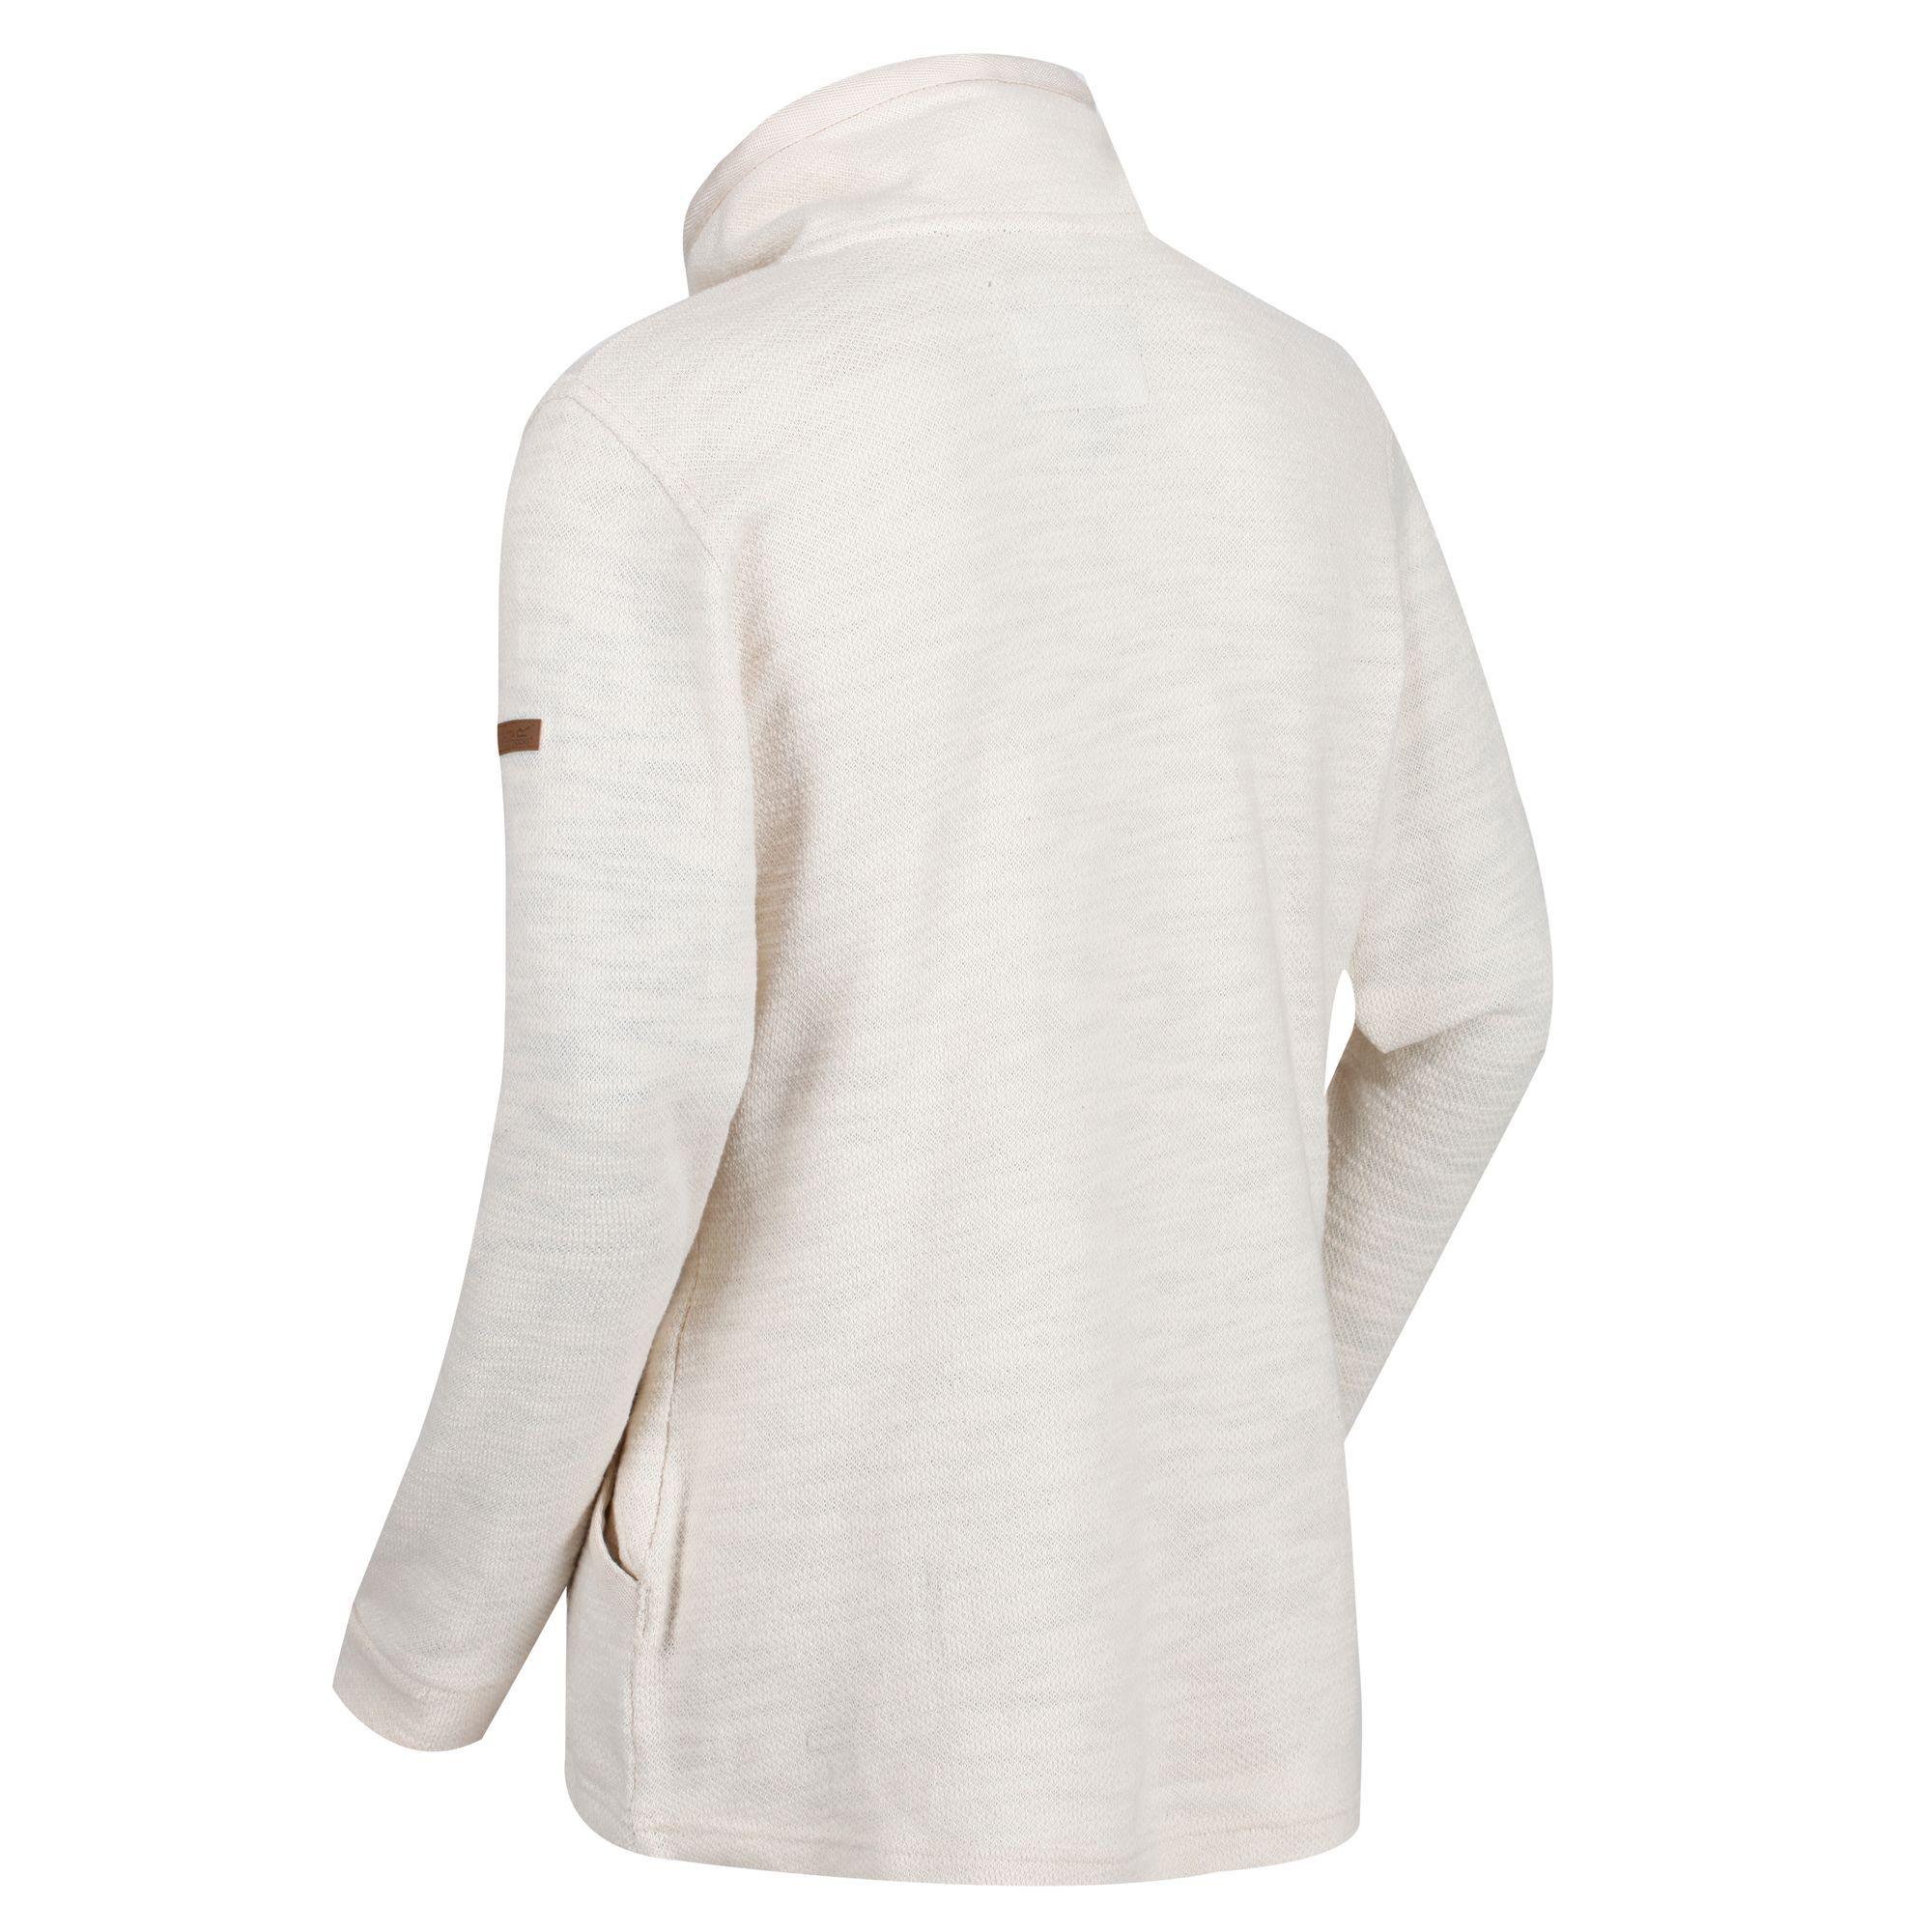 Regatta-Odetta-Womens-Warm-Curved-Full-Zip-Fleece-Jacket-RRP-50 thumbnail 25